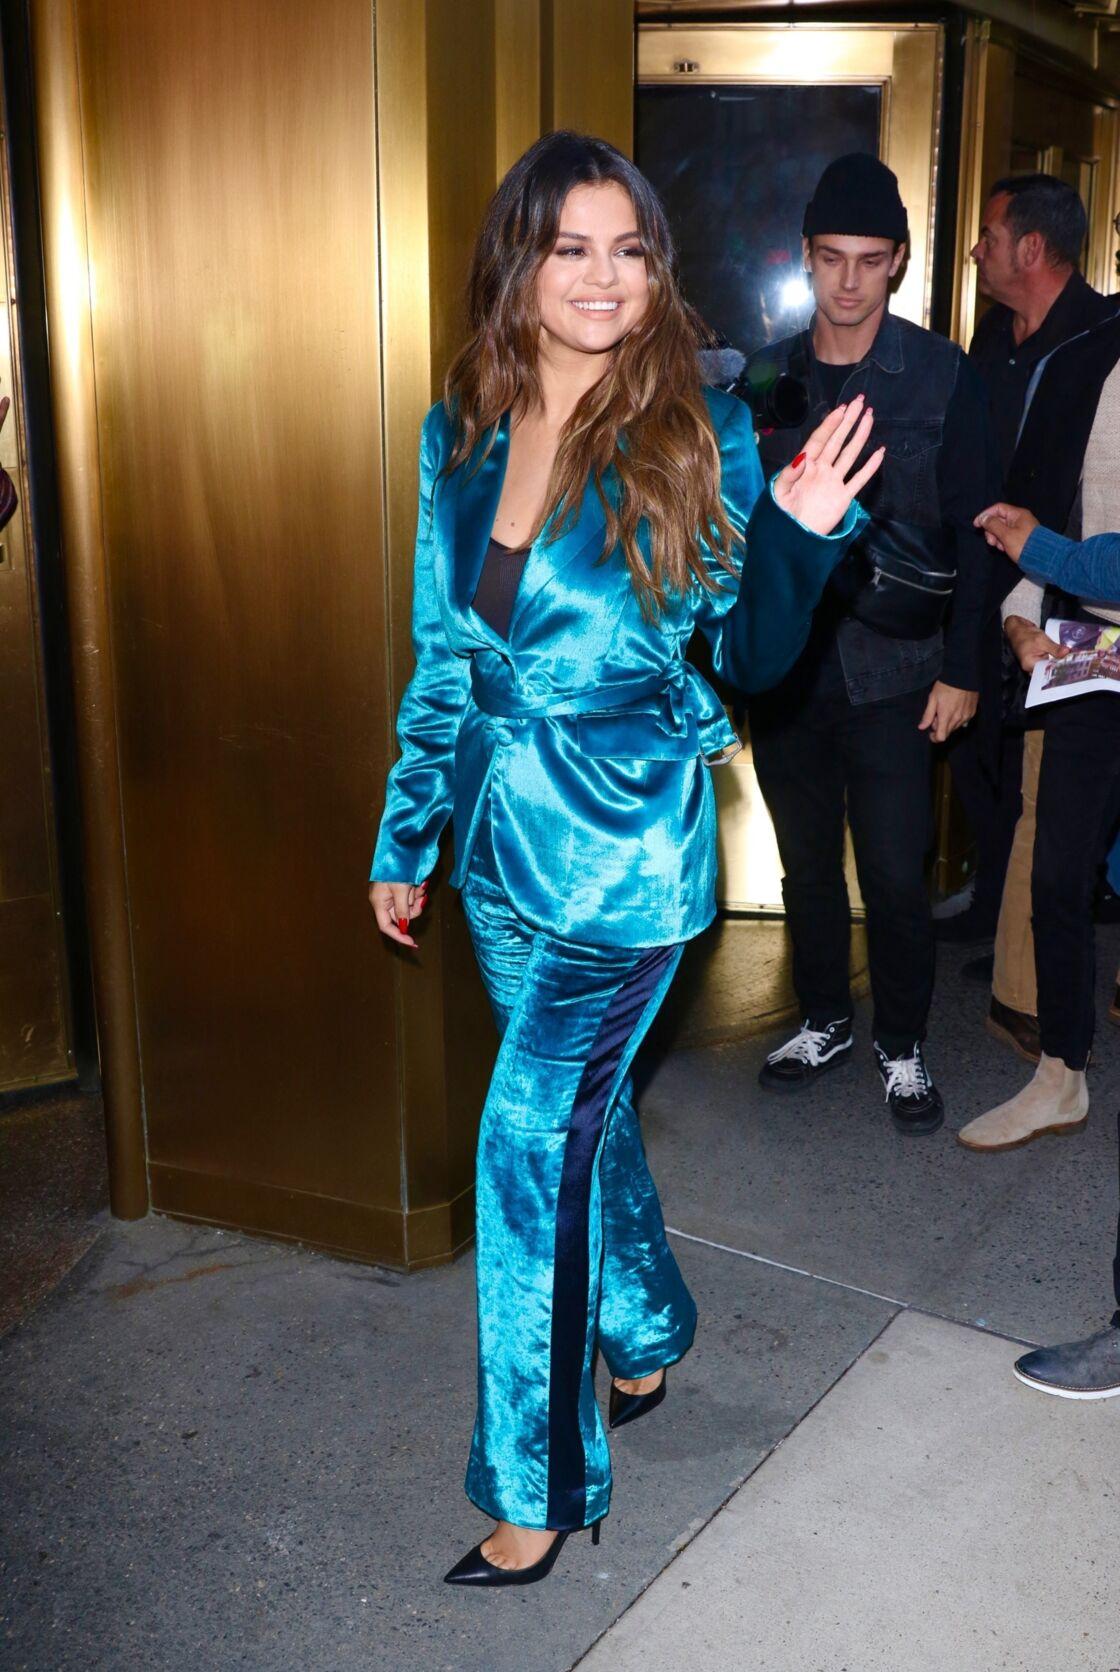 Rétro, Selena Gomez illumine les rues de New York en costume bleu flashy en velours